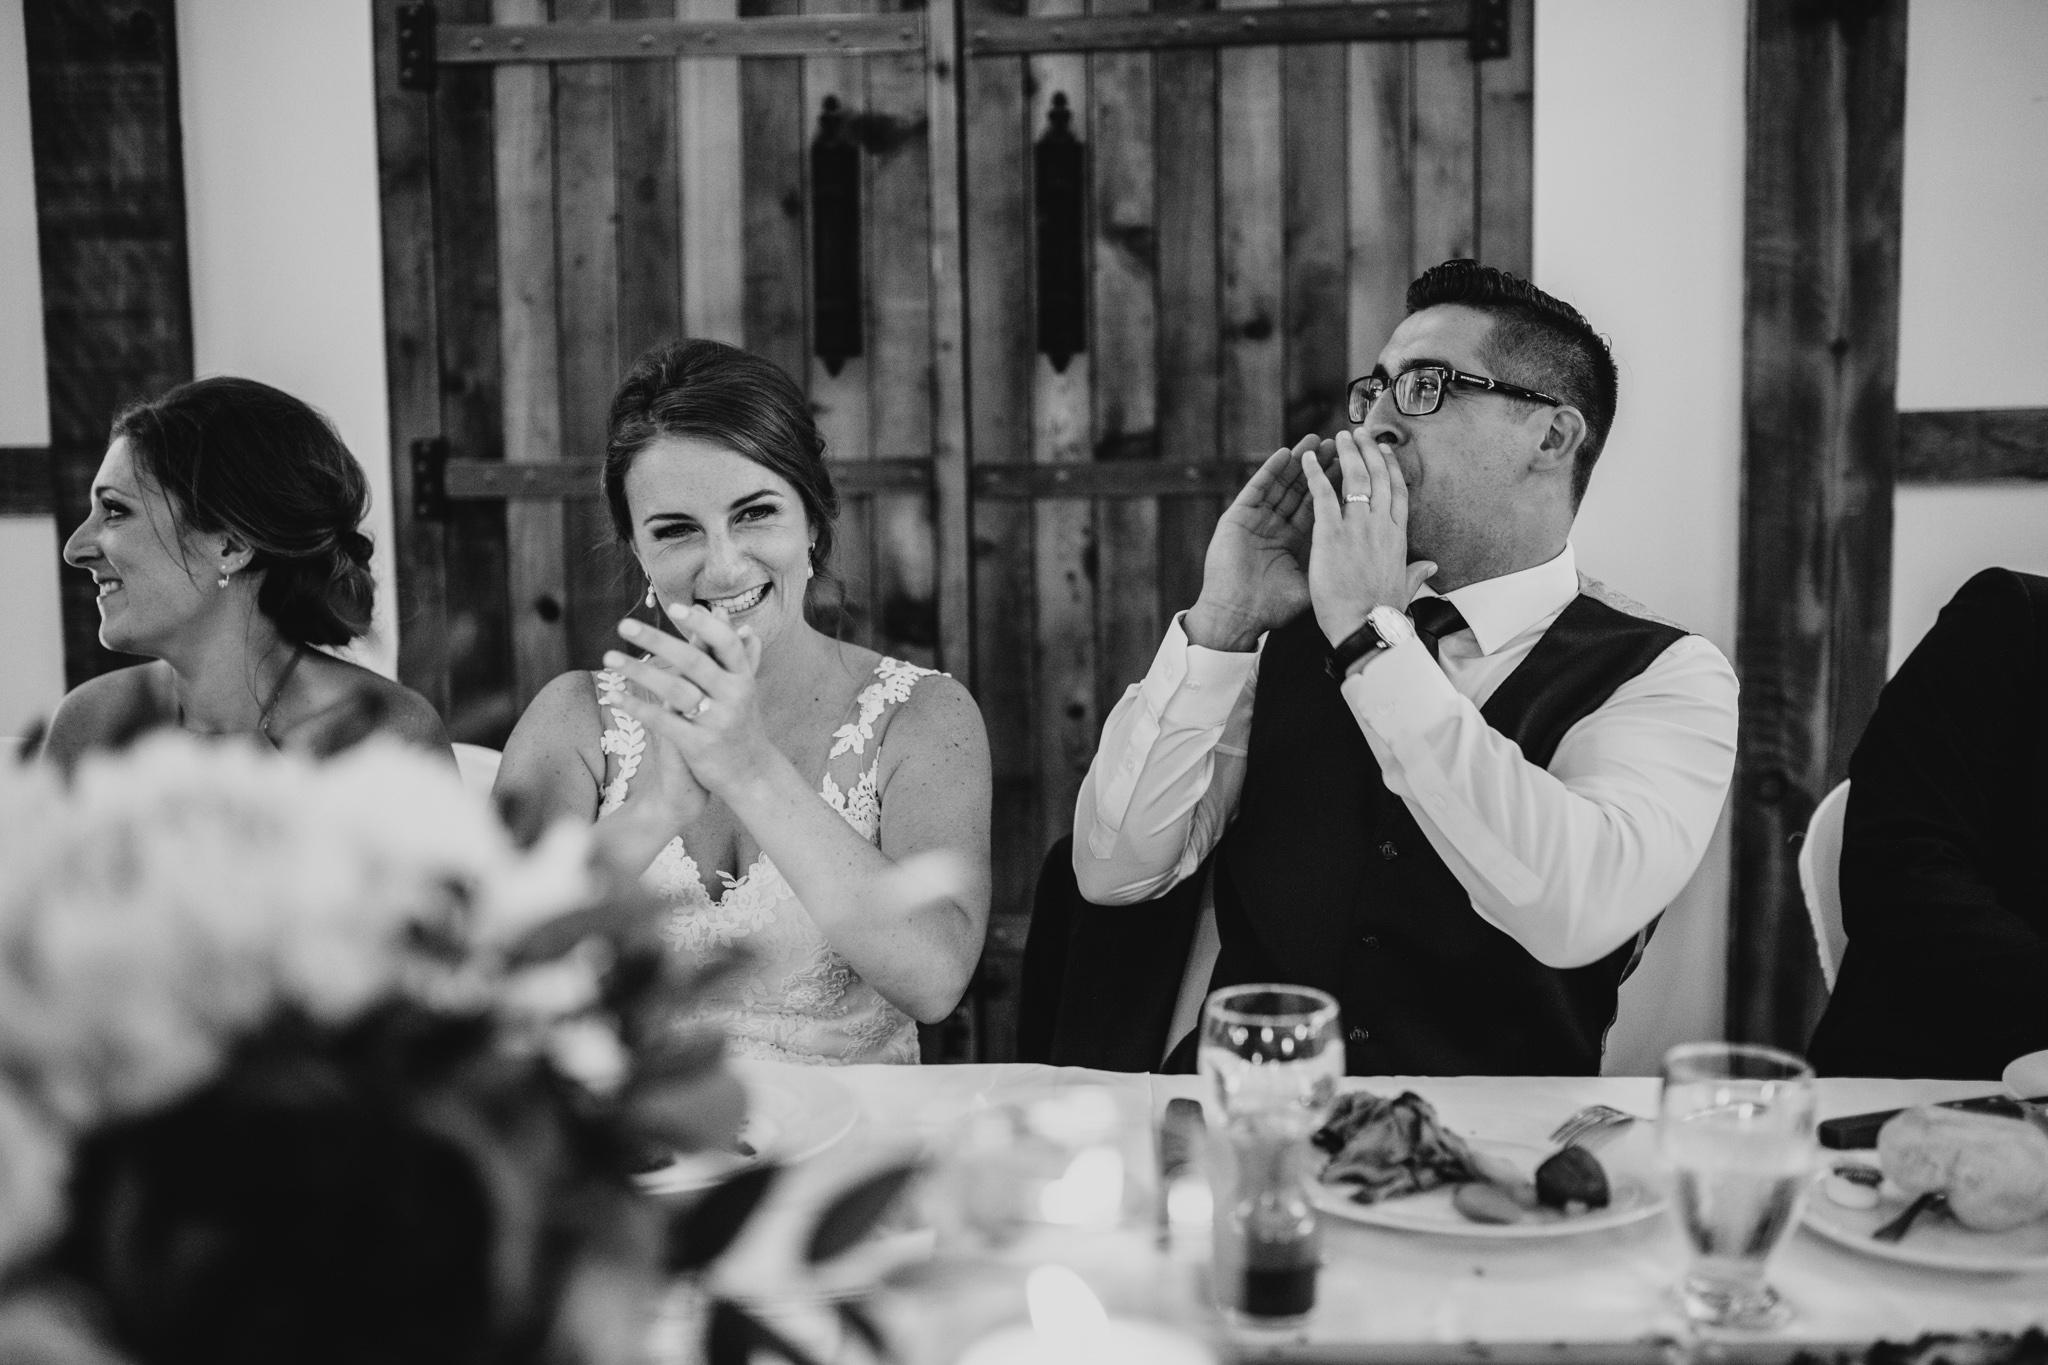 683-WEB-Jonathan-Kuhn-Photography-Susan-Dave-Wedding-7290.jpg